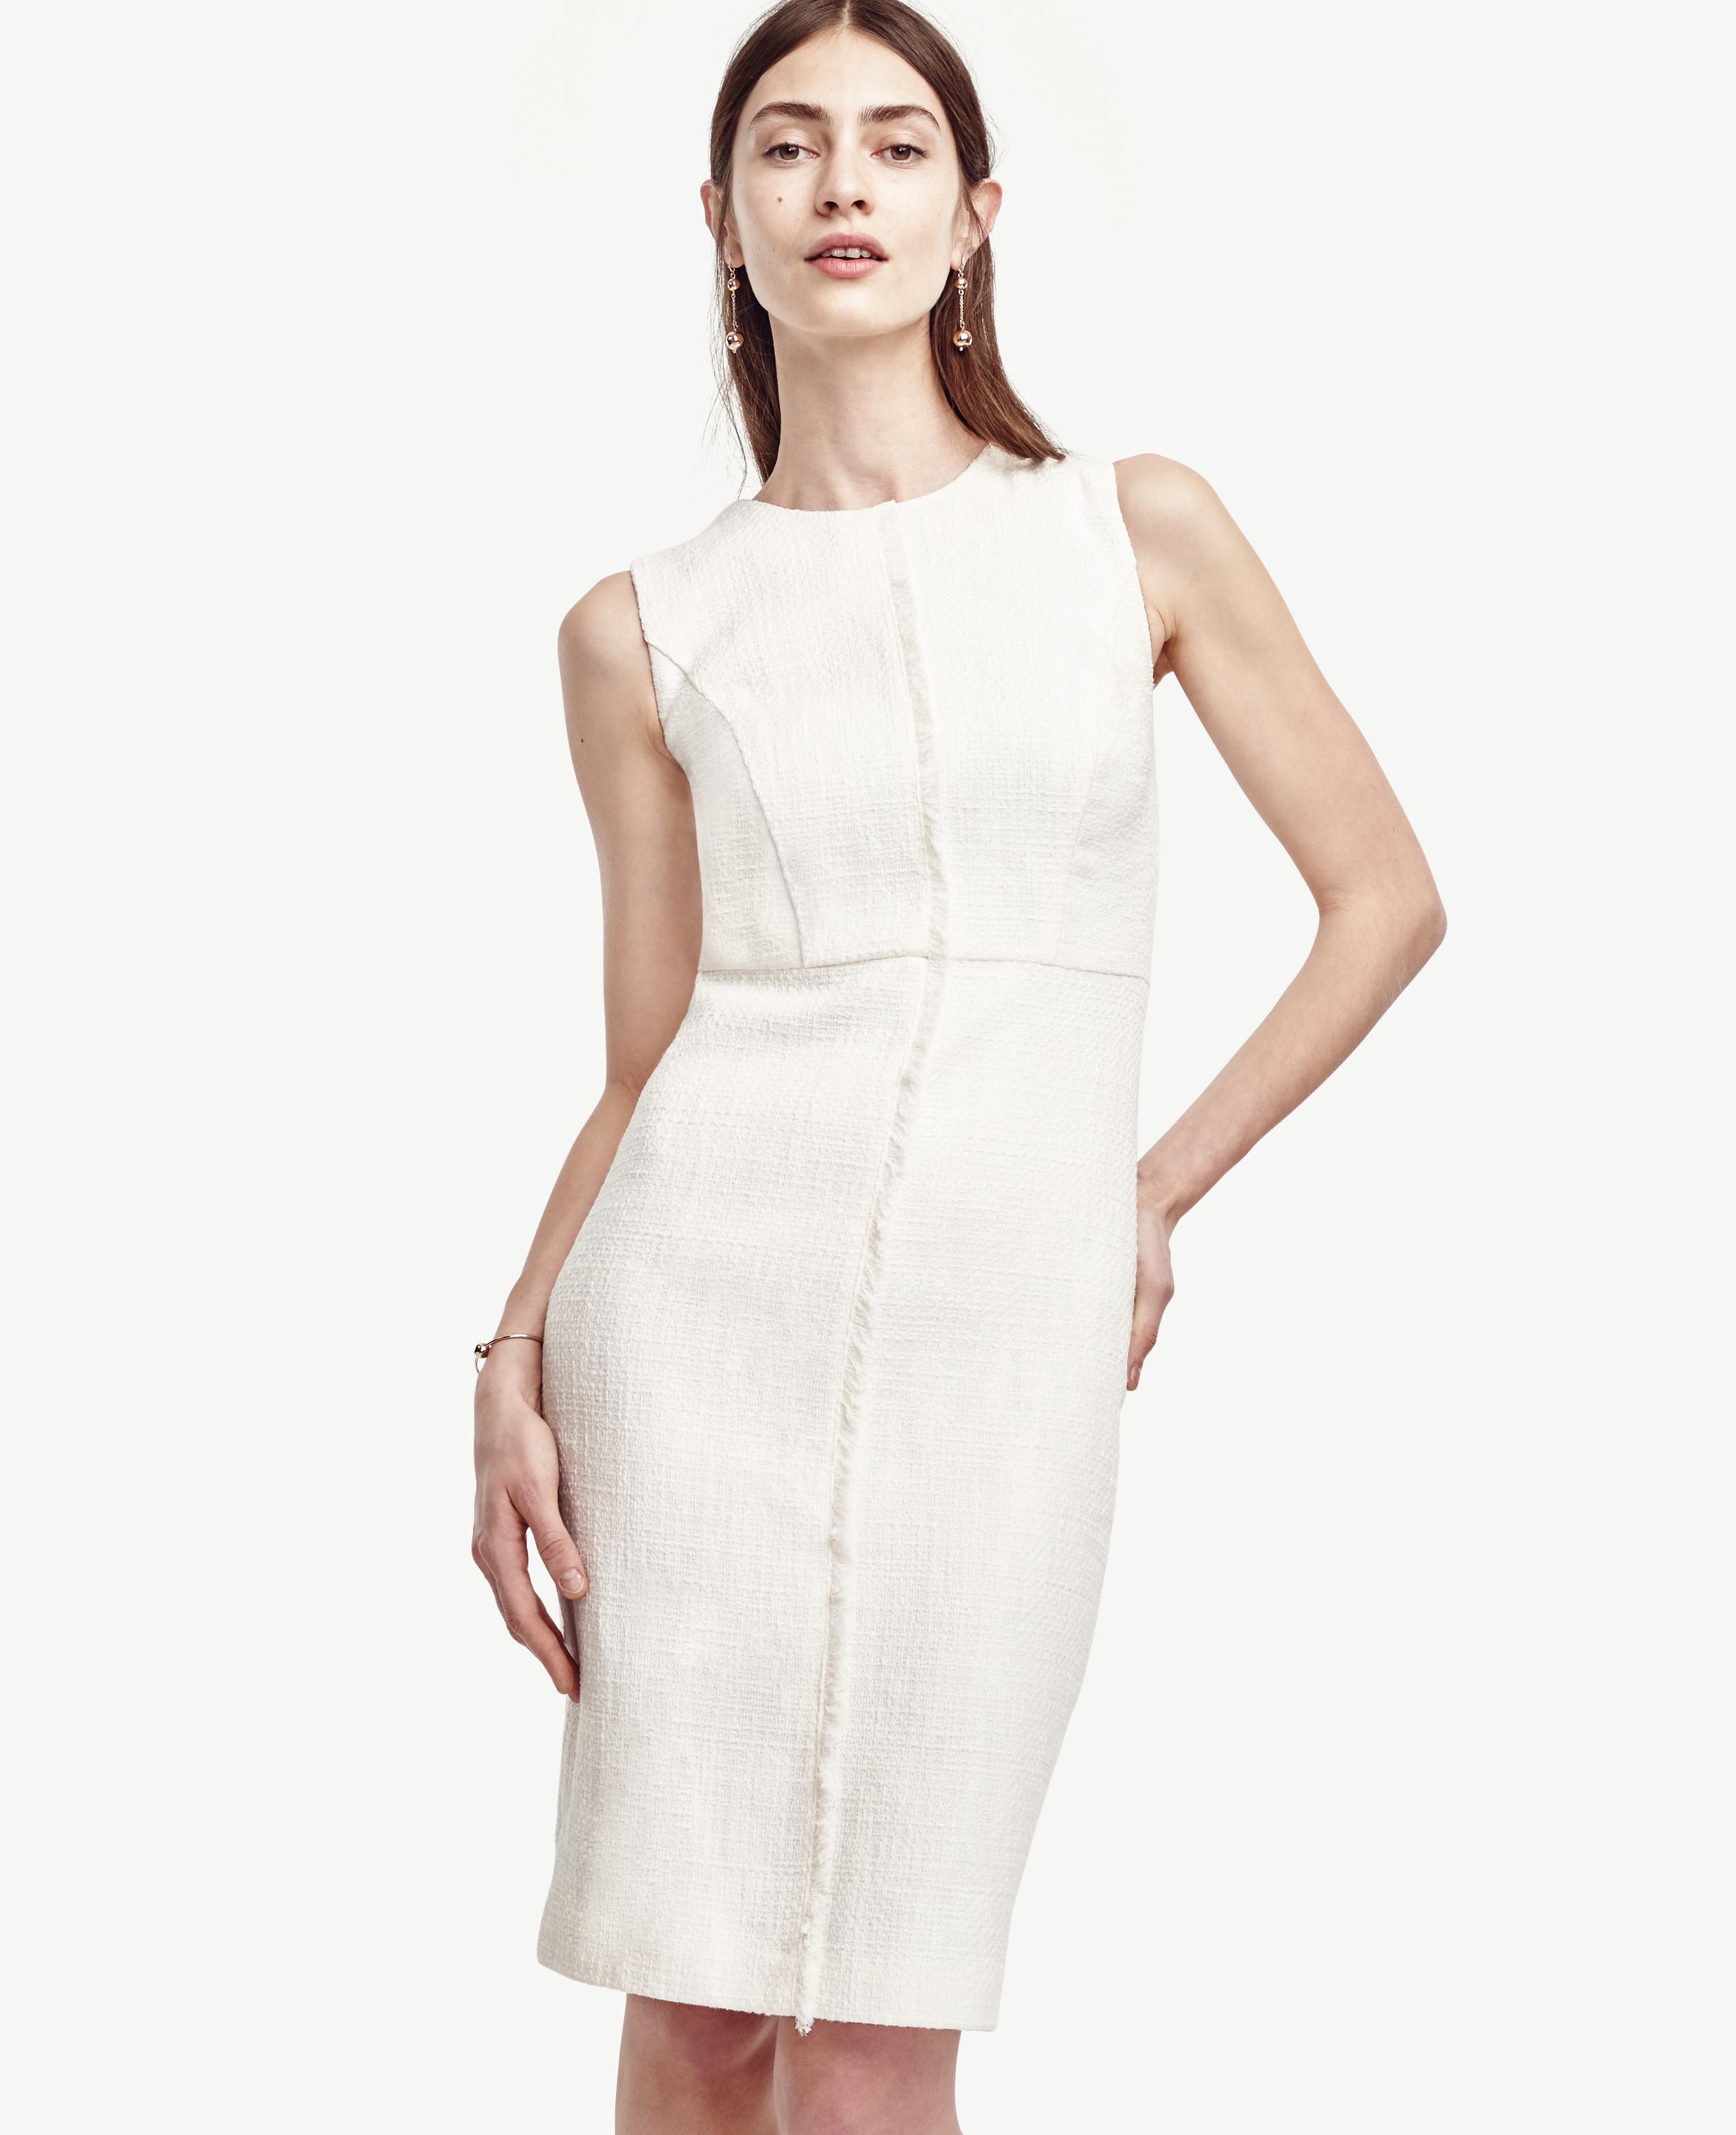 681a3866ac Ann Taylor Petite Tweed Fringe Sheath Dress in White - Lyst